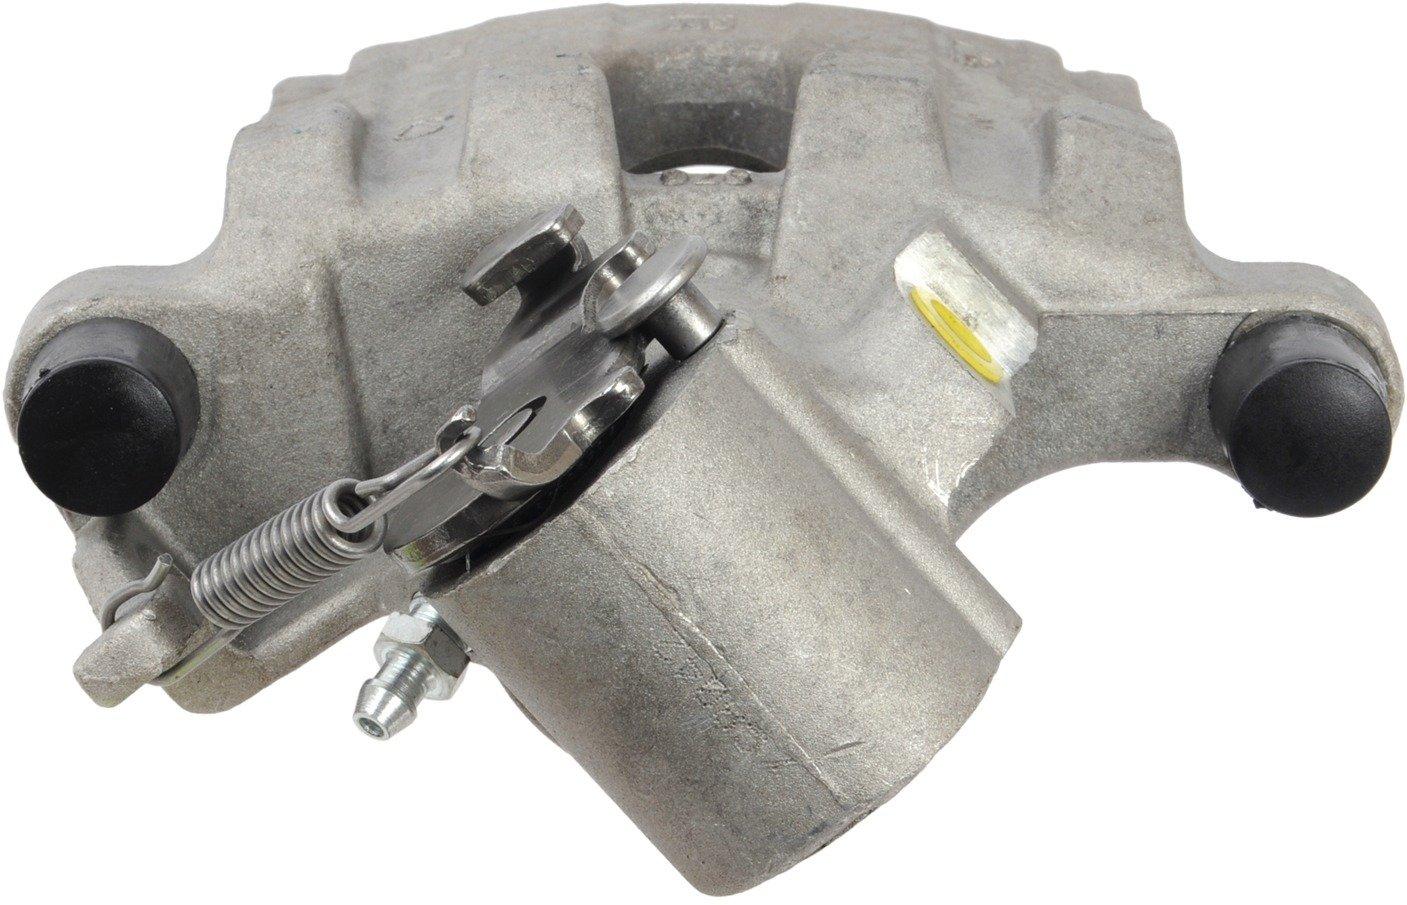 Cardone 18-5239 Remanufactured Domestic Friction Ready Brake Caliper Unloaded